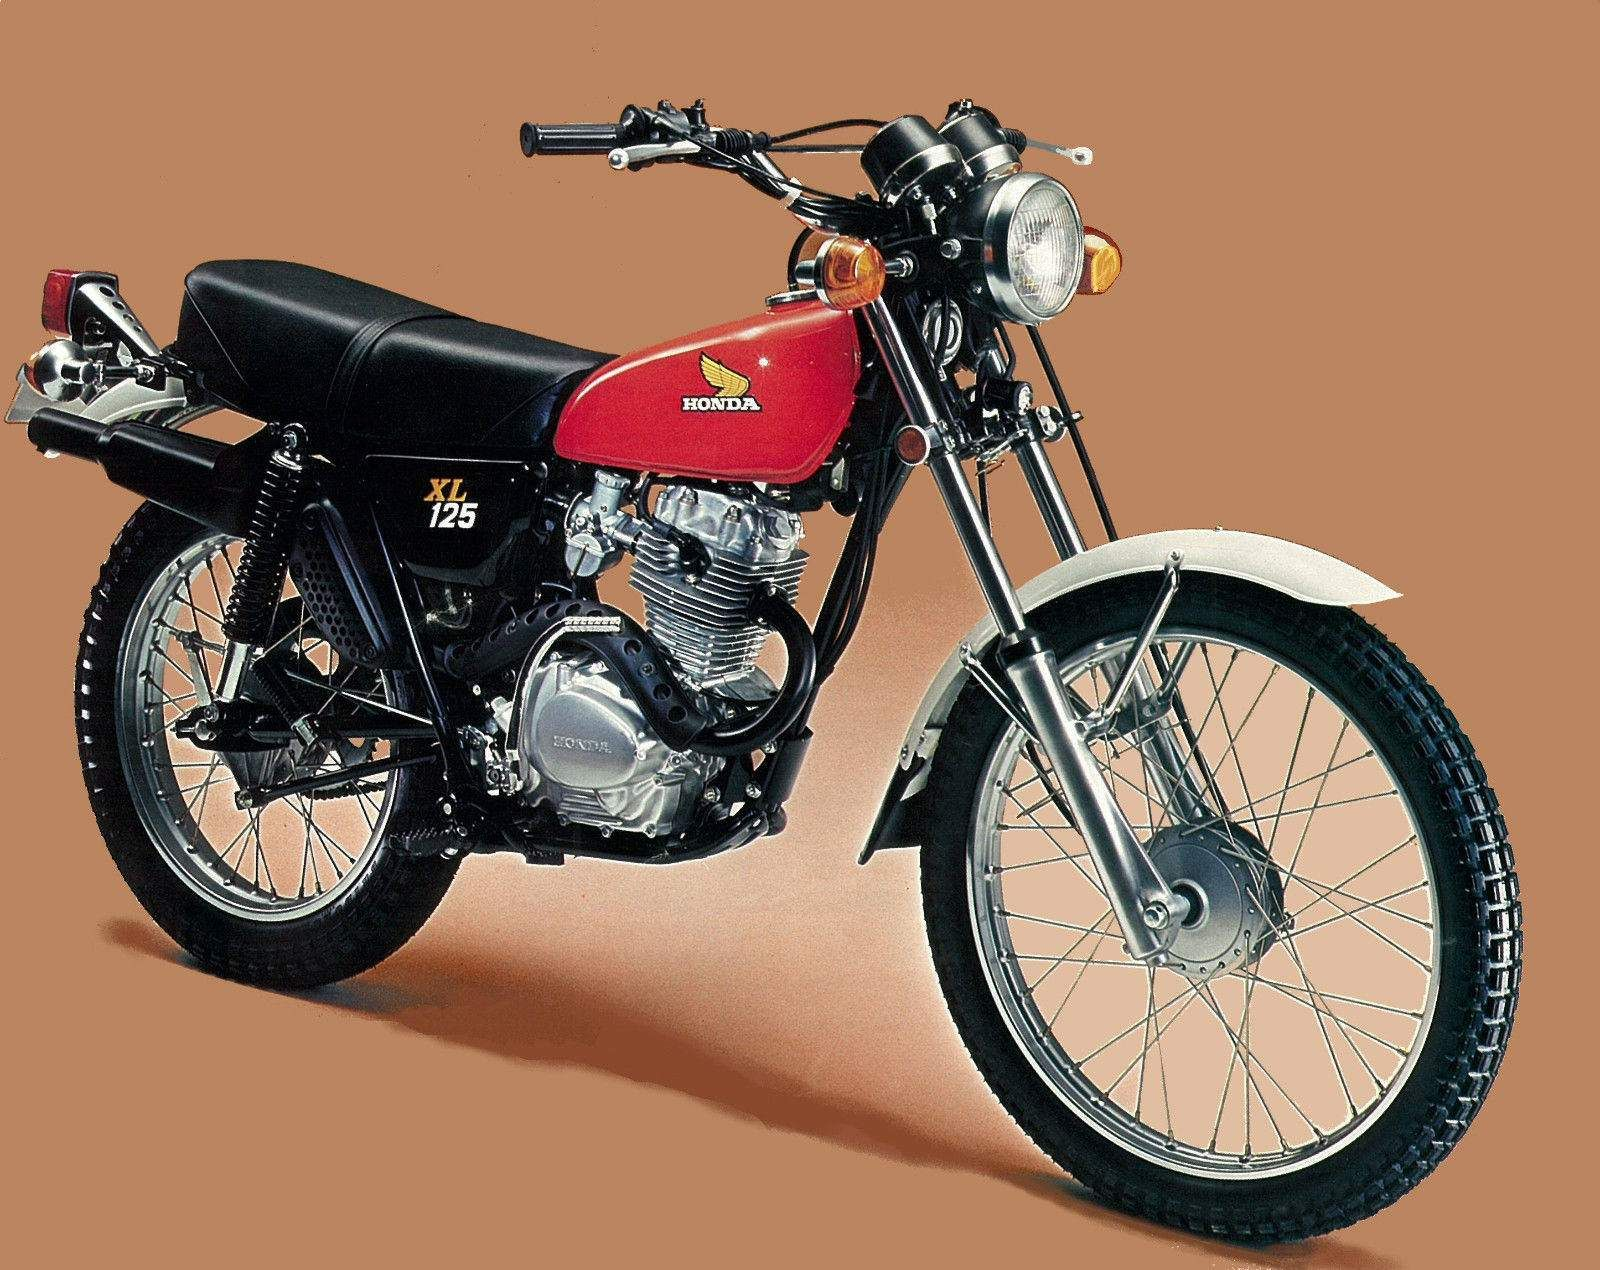 Honda Xl125s Honda Motorcycles Vintage Honda Motorcycles